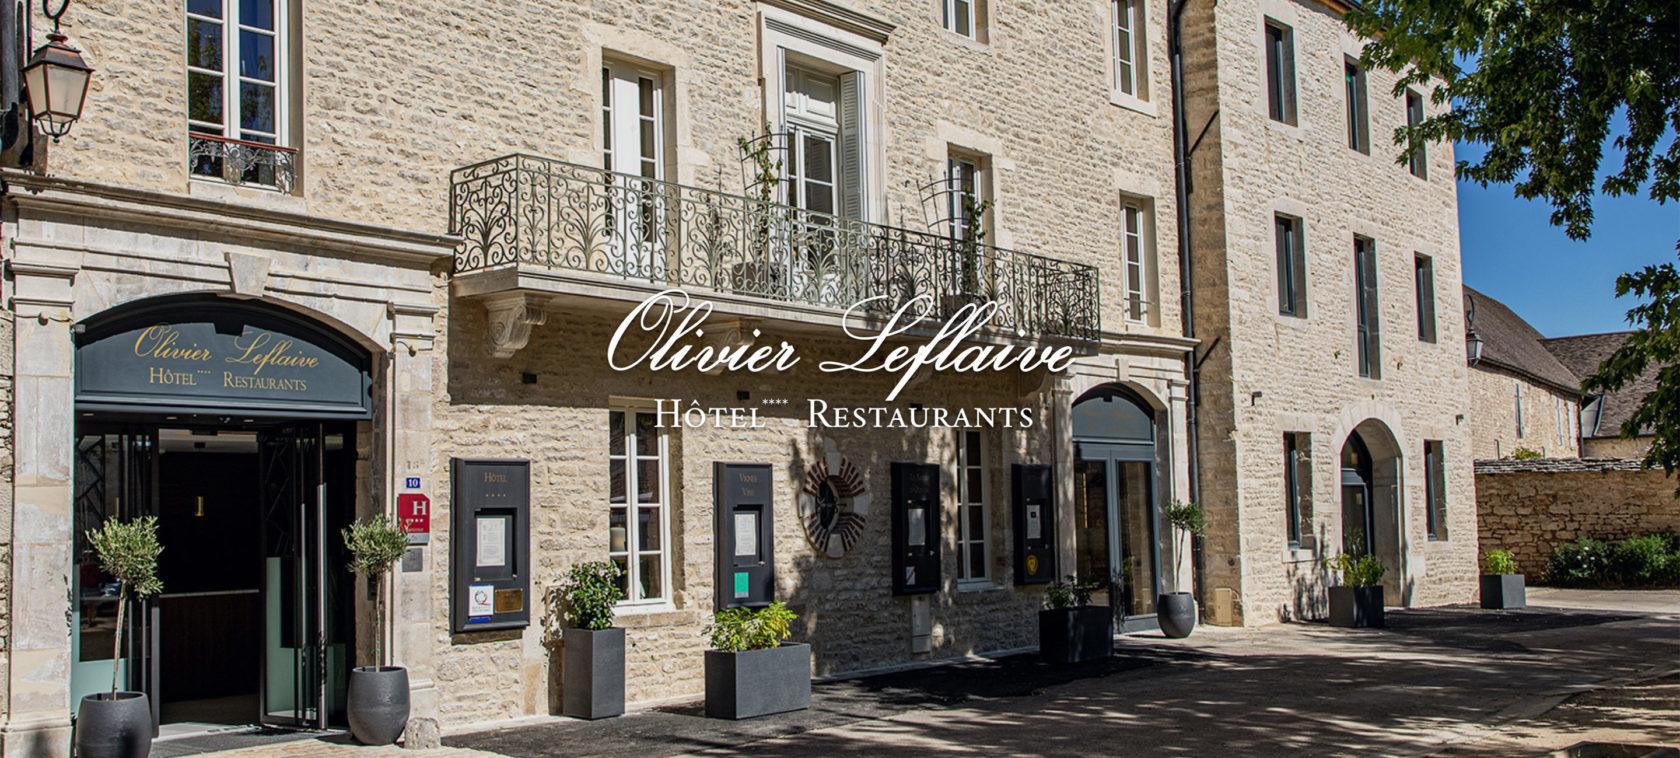 olivier-leflaive-hotel-retaurants-scaled-aspect-ratio-1680-758